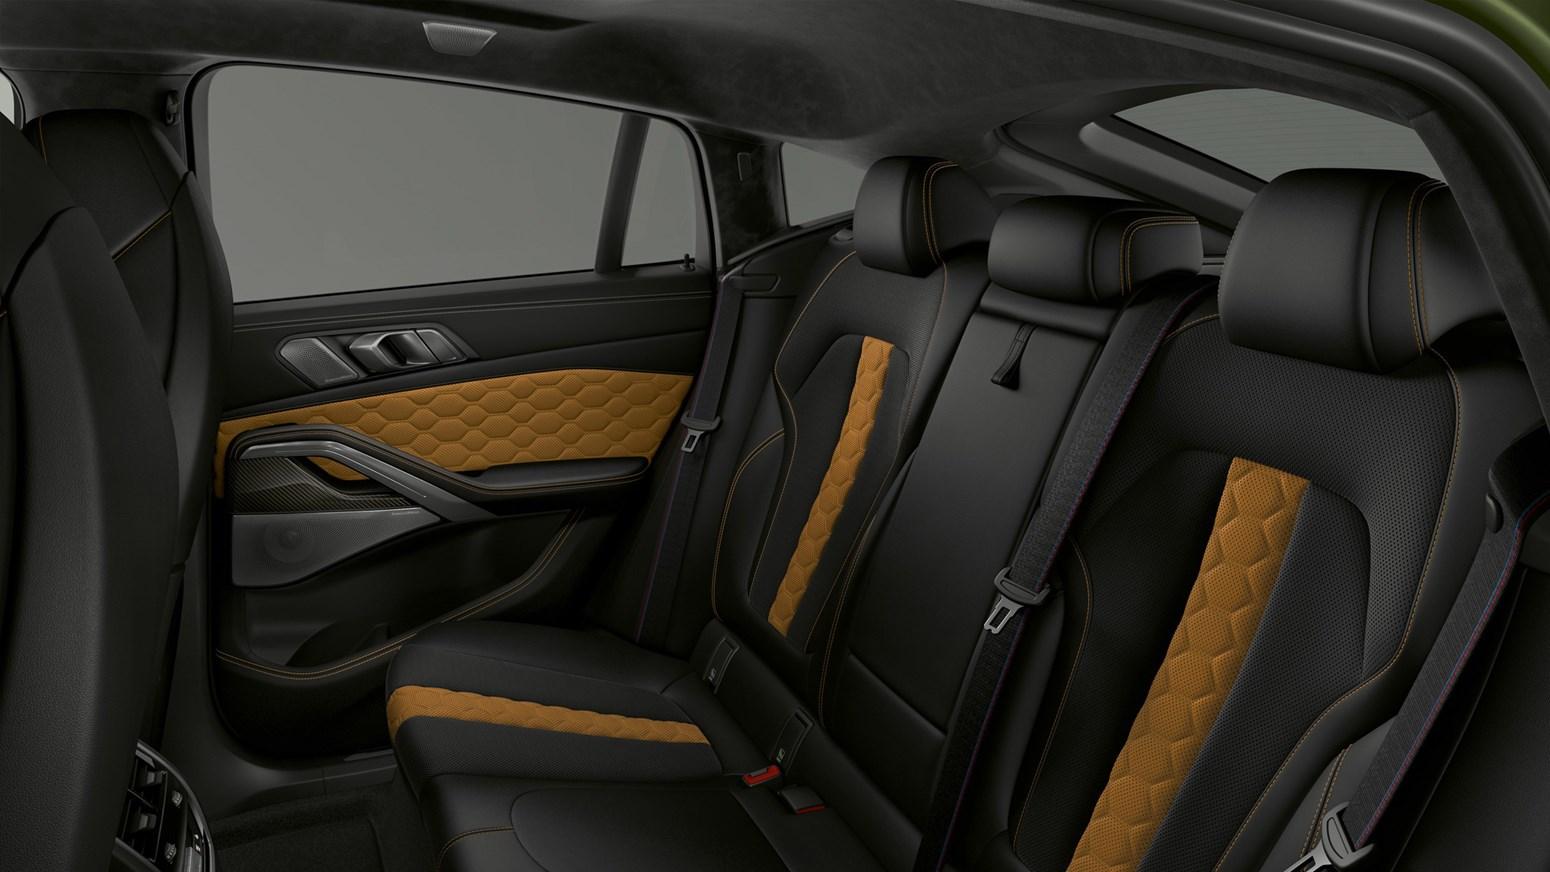 BMW X6 M GALLERY 2440X1373 D